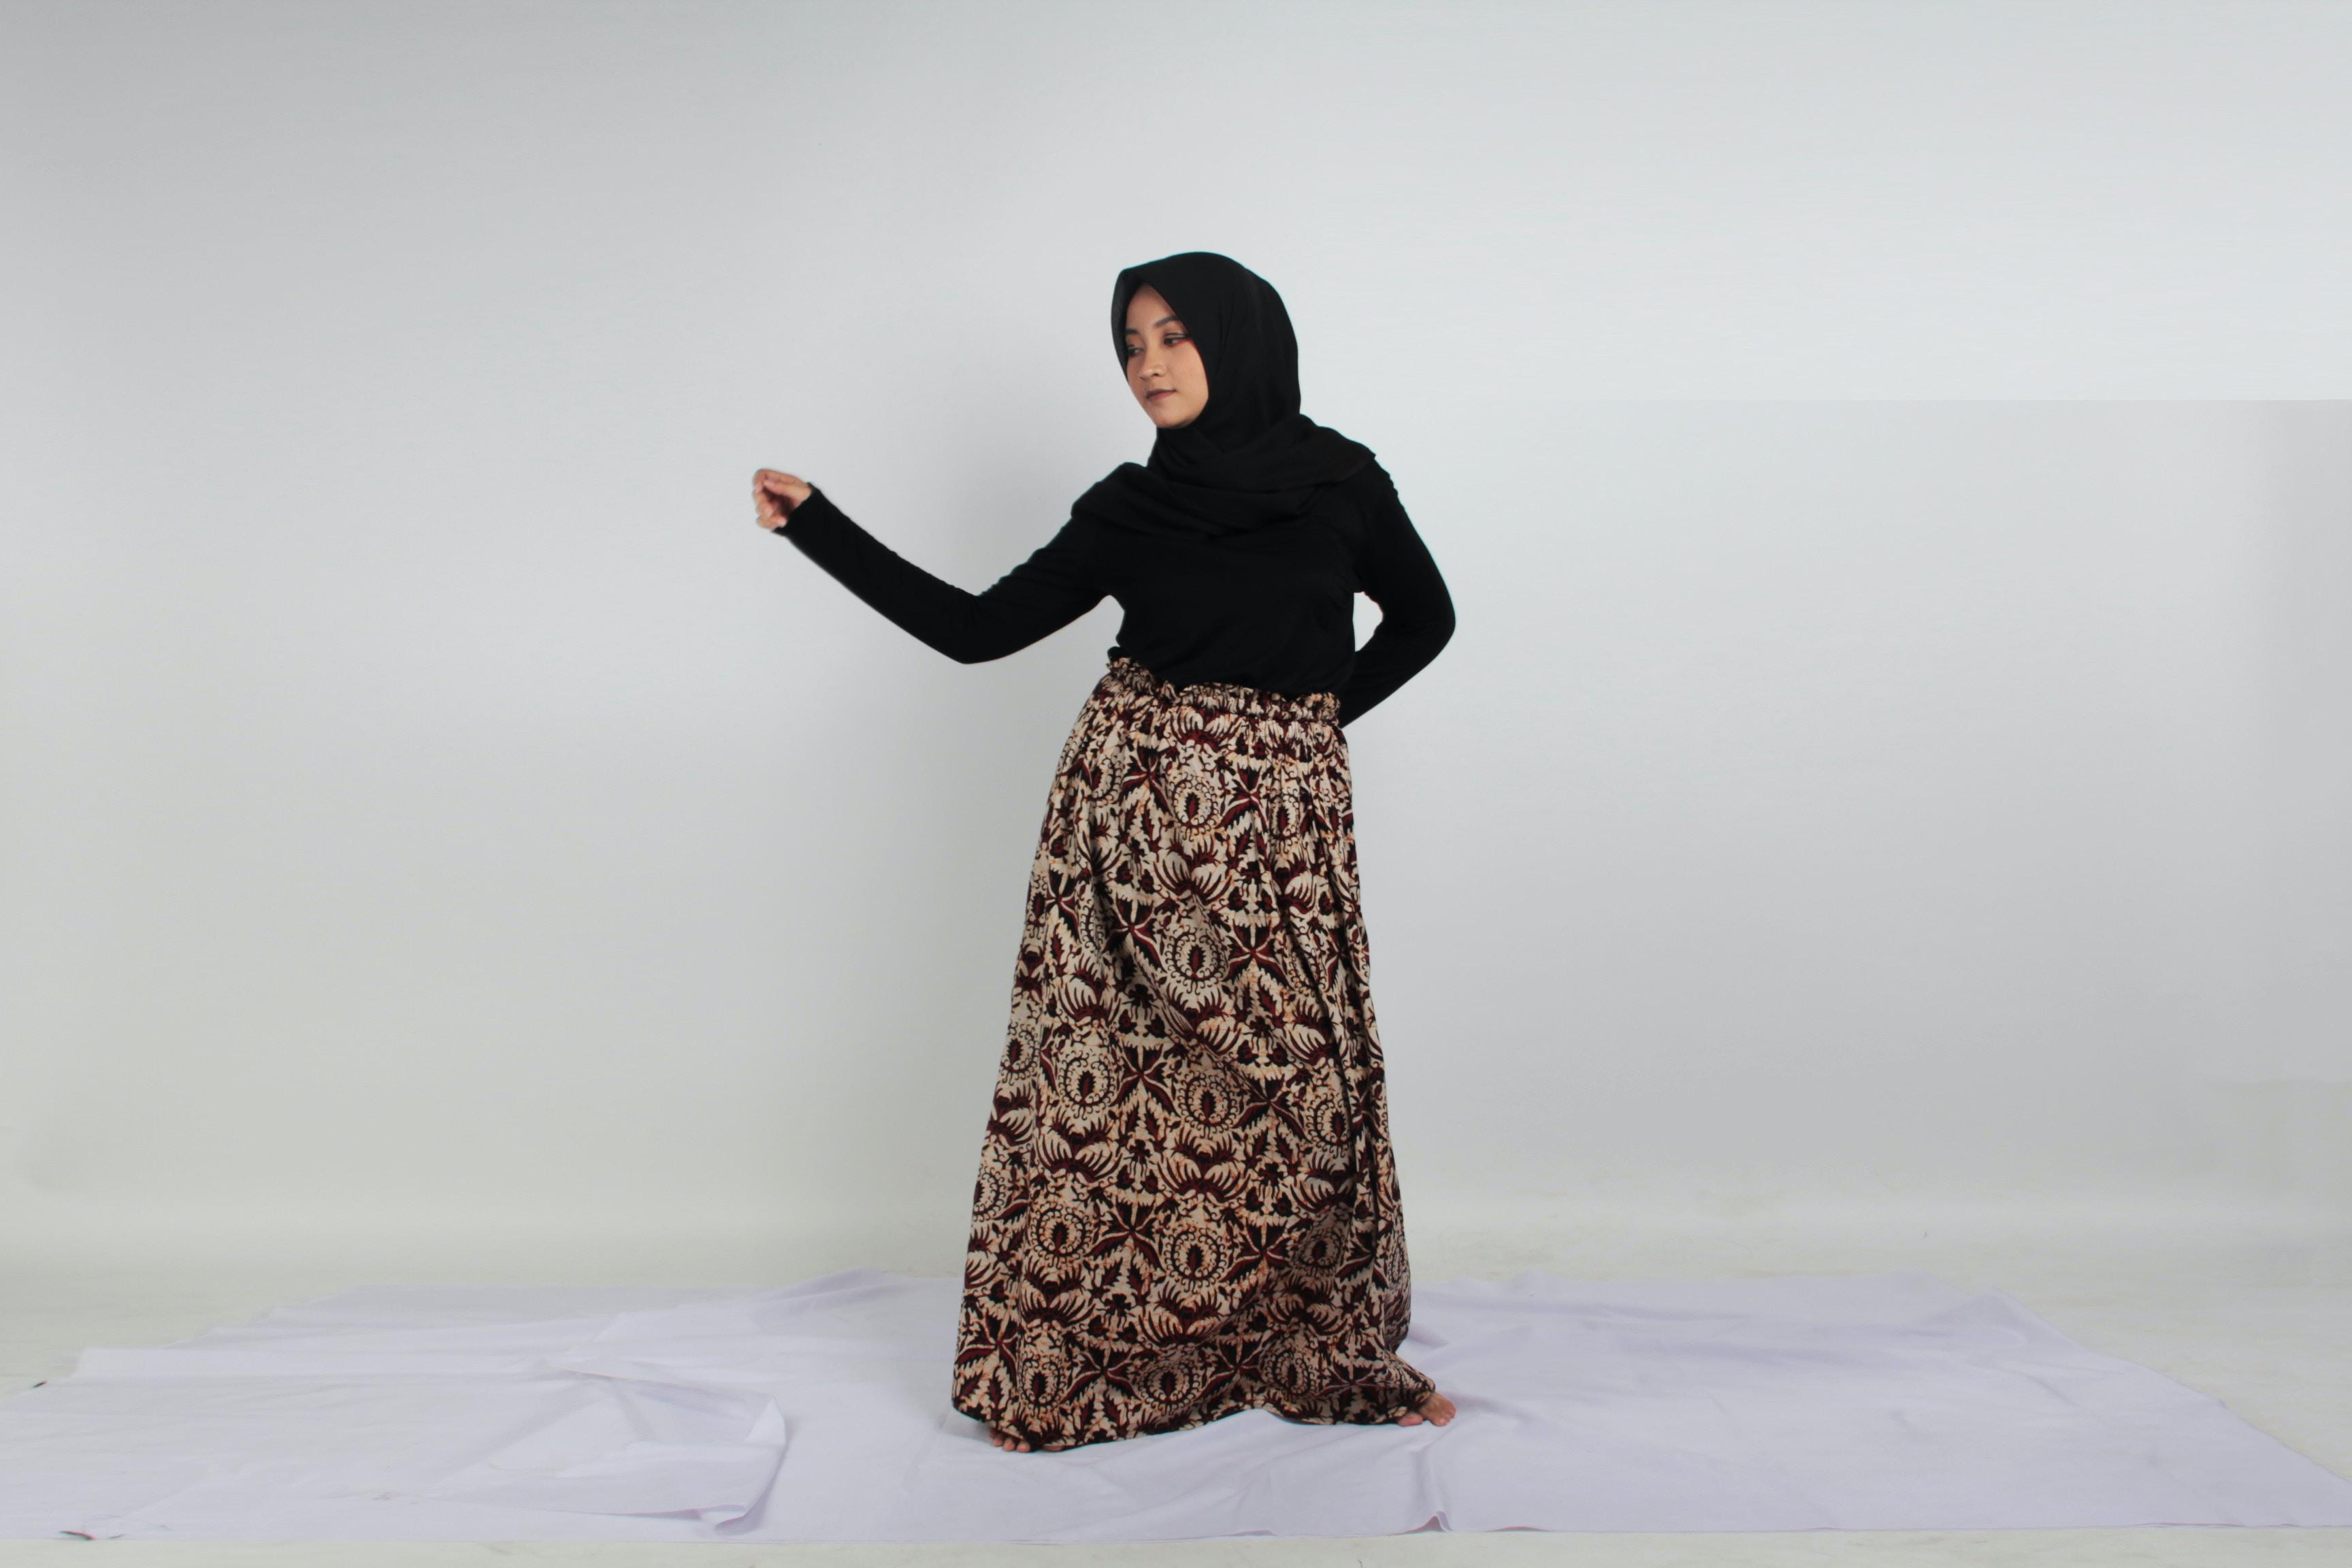 woman wearing brown and black abaya dress